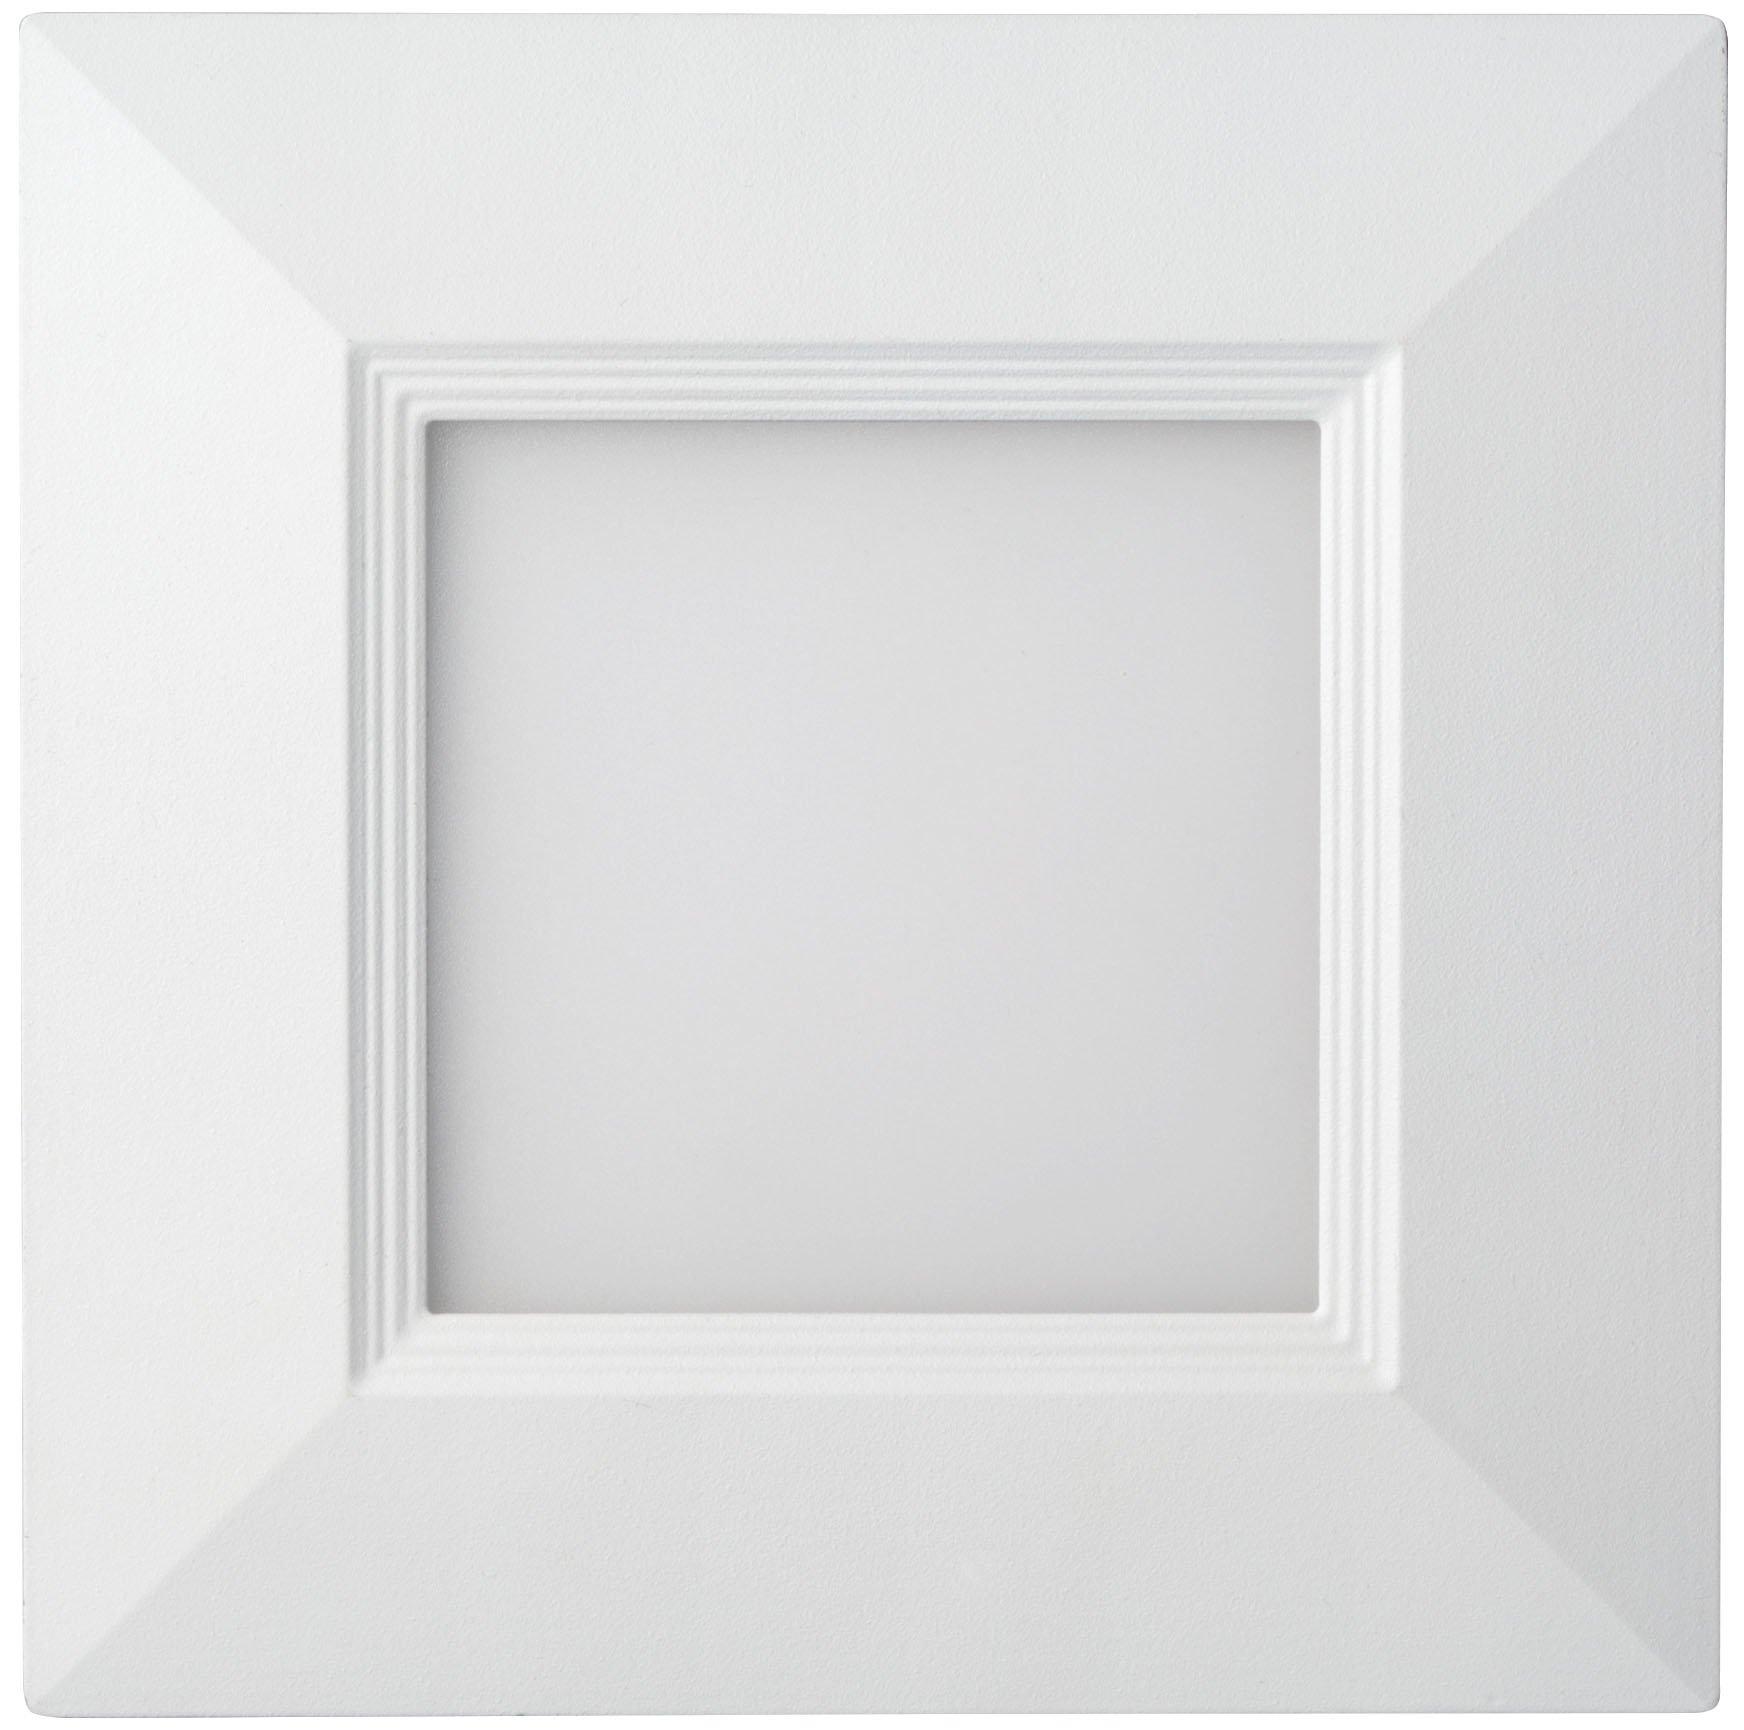 Lithonia Lighting WF4 SQ B LED 27K MW M6 Ultra-Thin Square LED Recessed Ceiling Light, 2700K | Warm White, Matte White by Lithonia Lighting (Image #4)